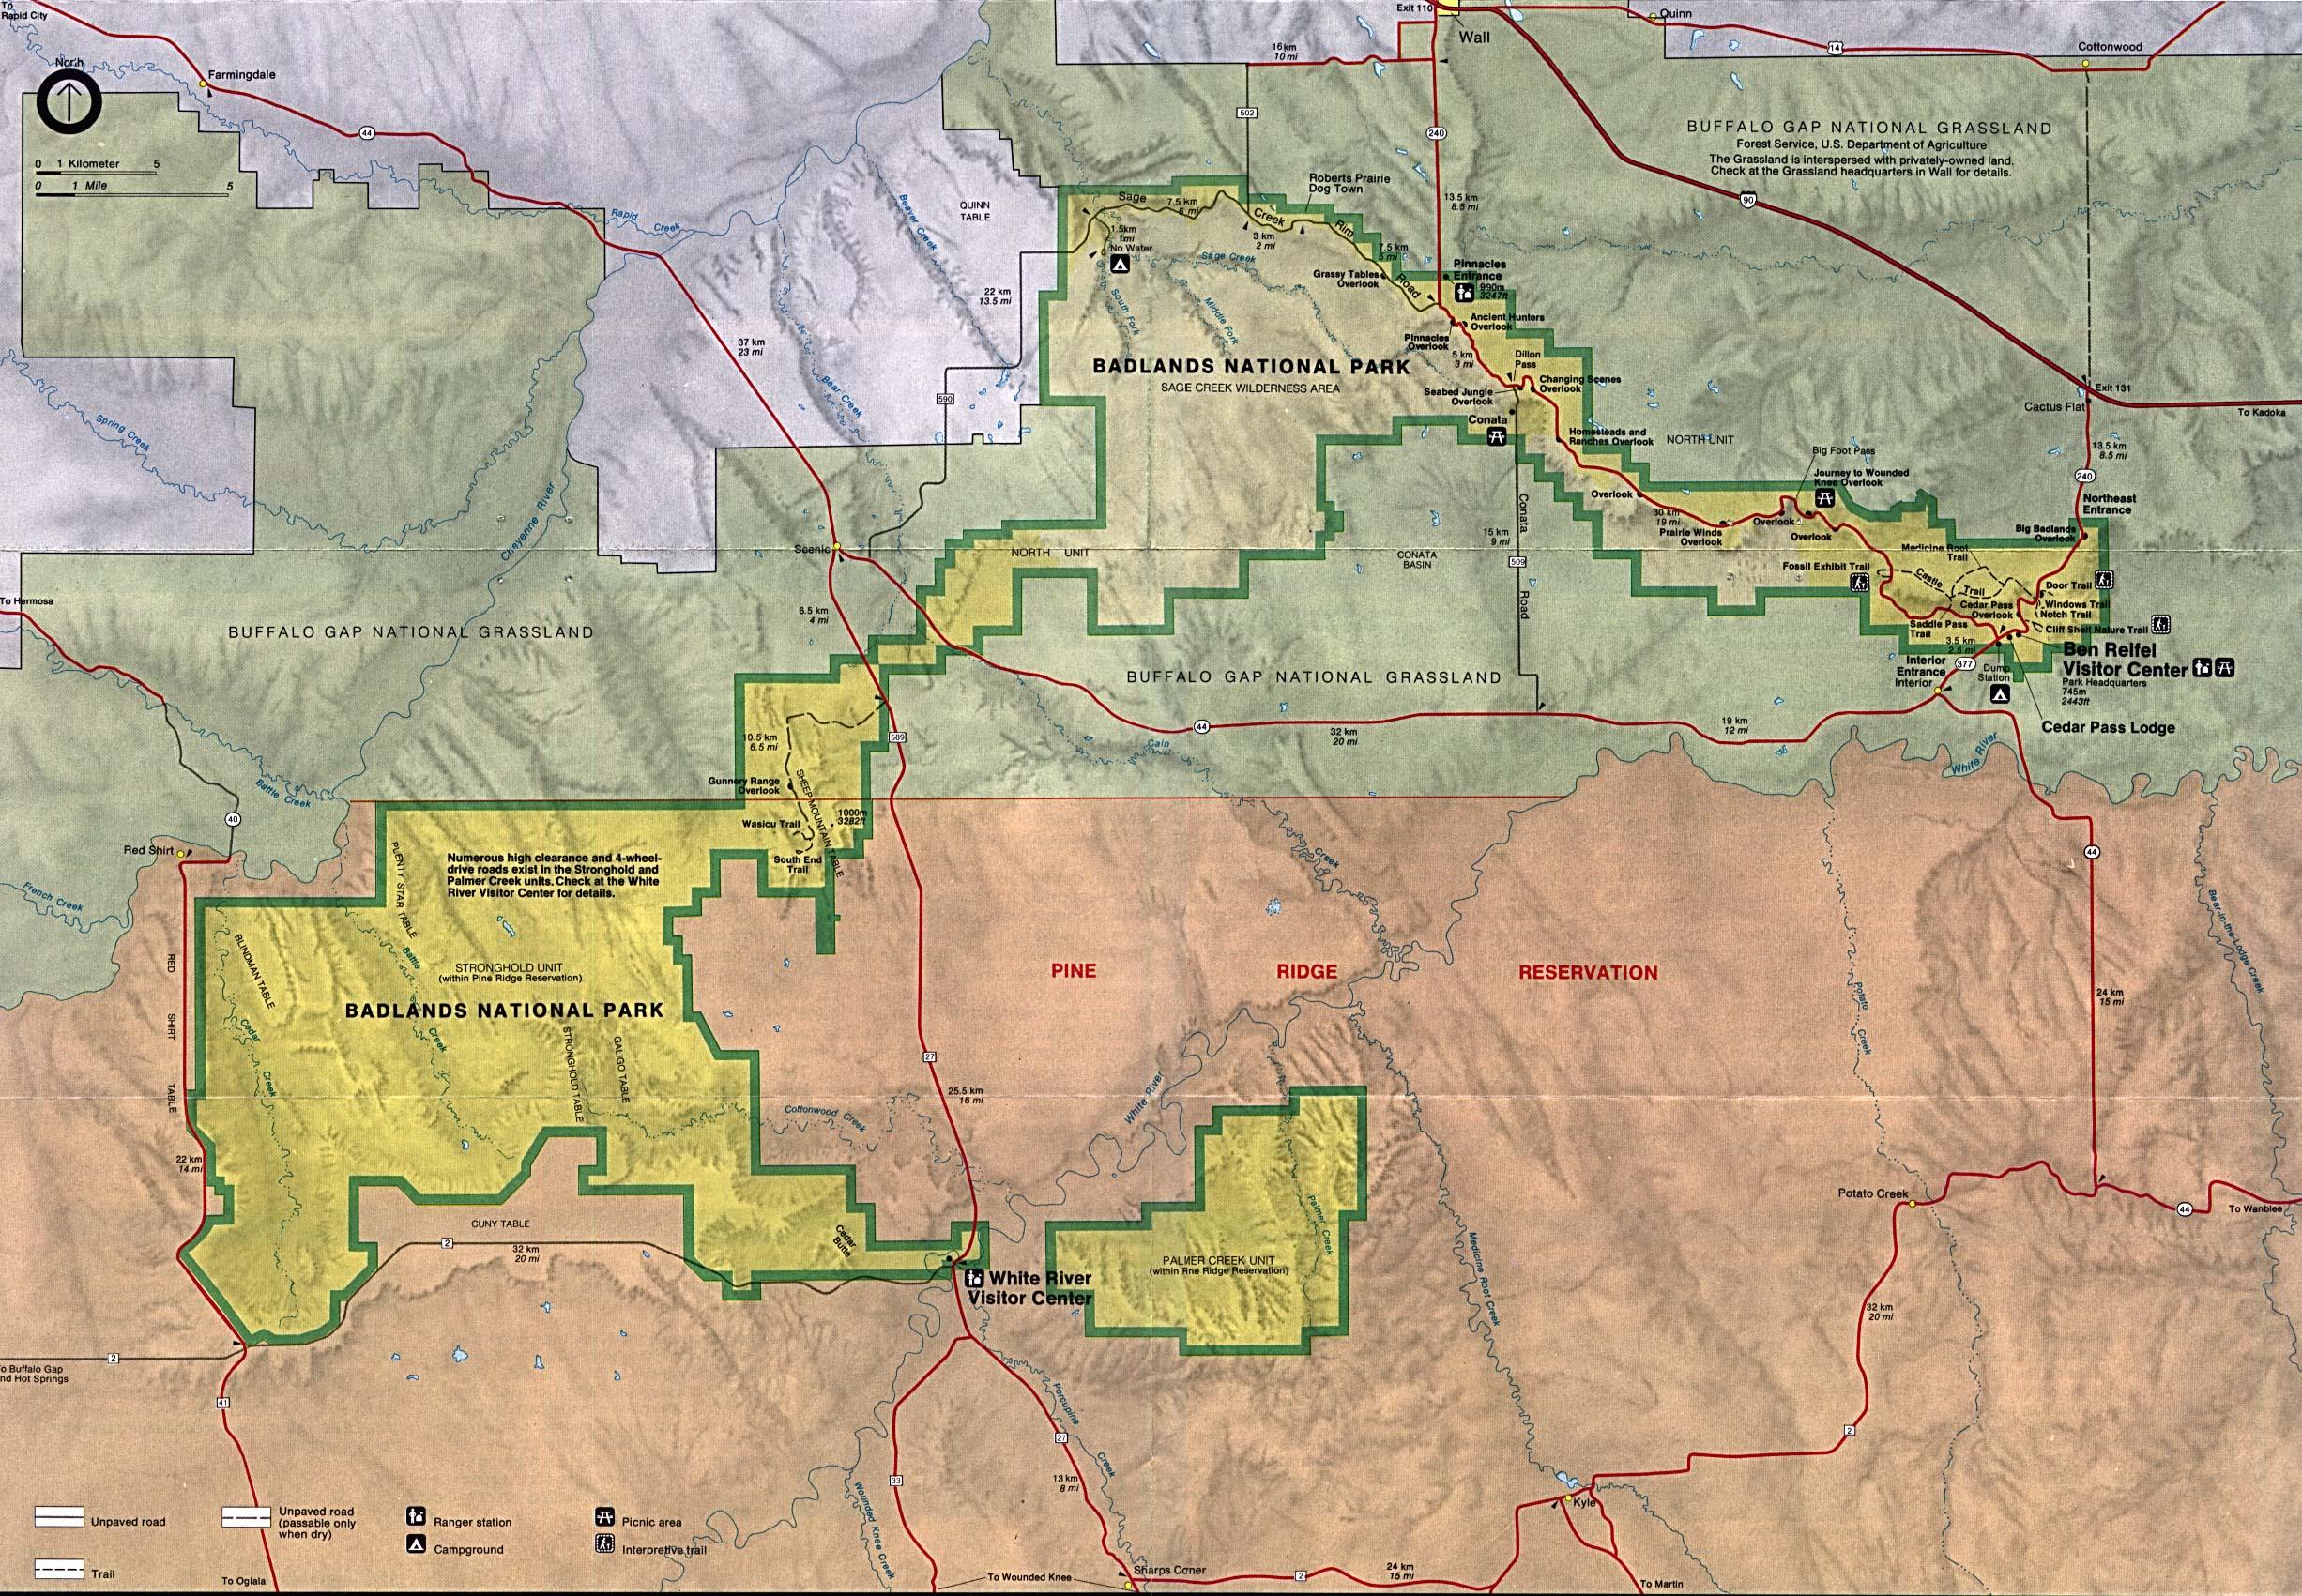 Maps of United States National Parks, Monuments and Historic Sites Badlands National Park [South Dakota] (Park Map) 1995 (911K)